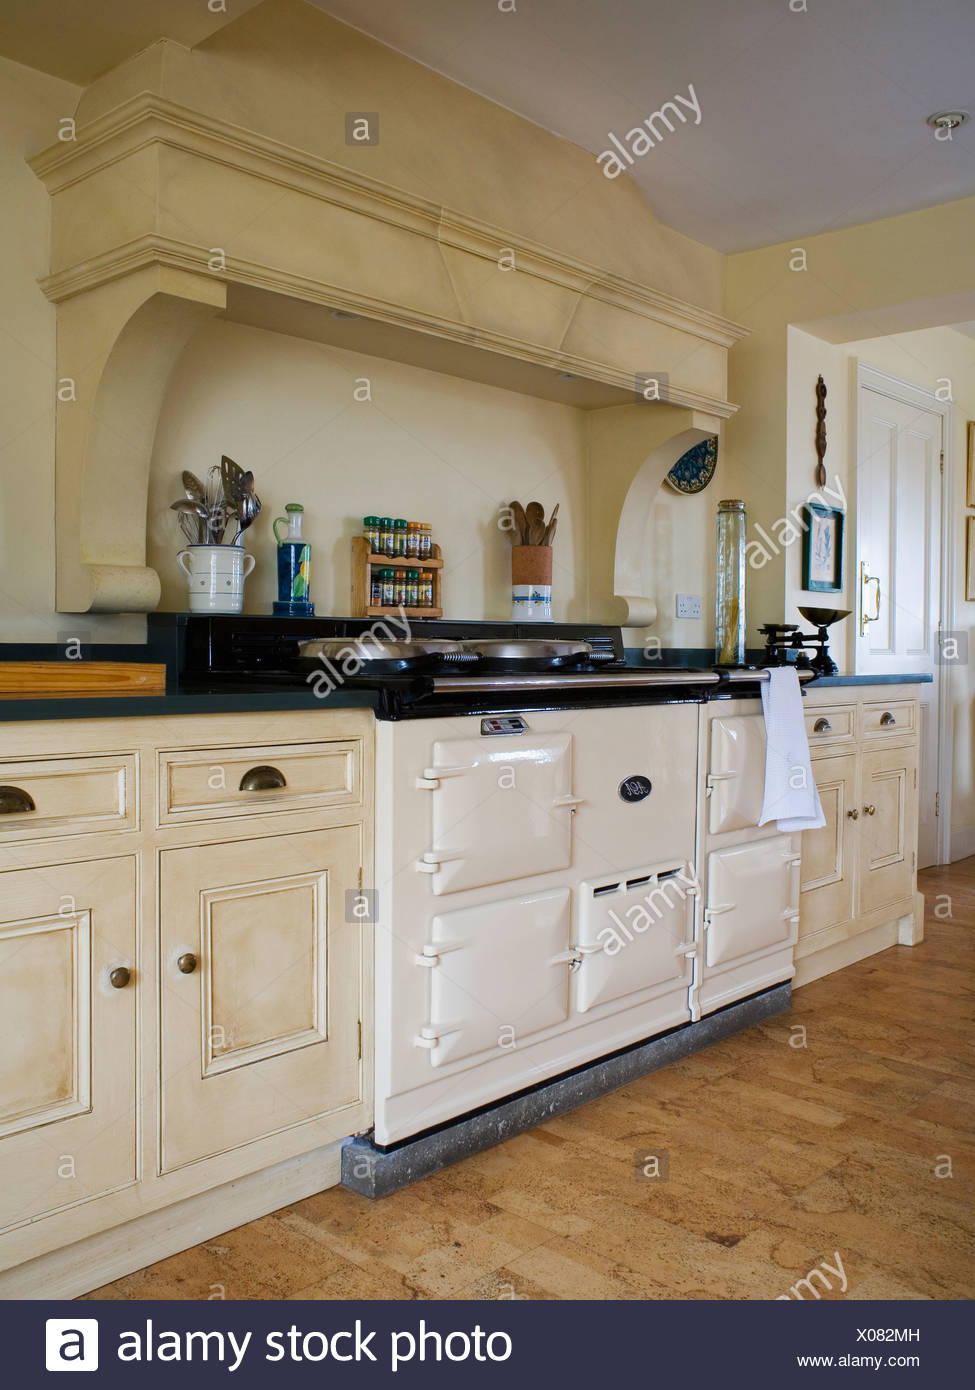 Creme double Aga-Ofen in cremefarbenen Landhausküche Stockfoto, Bild ...